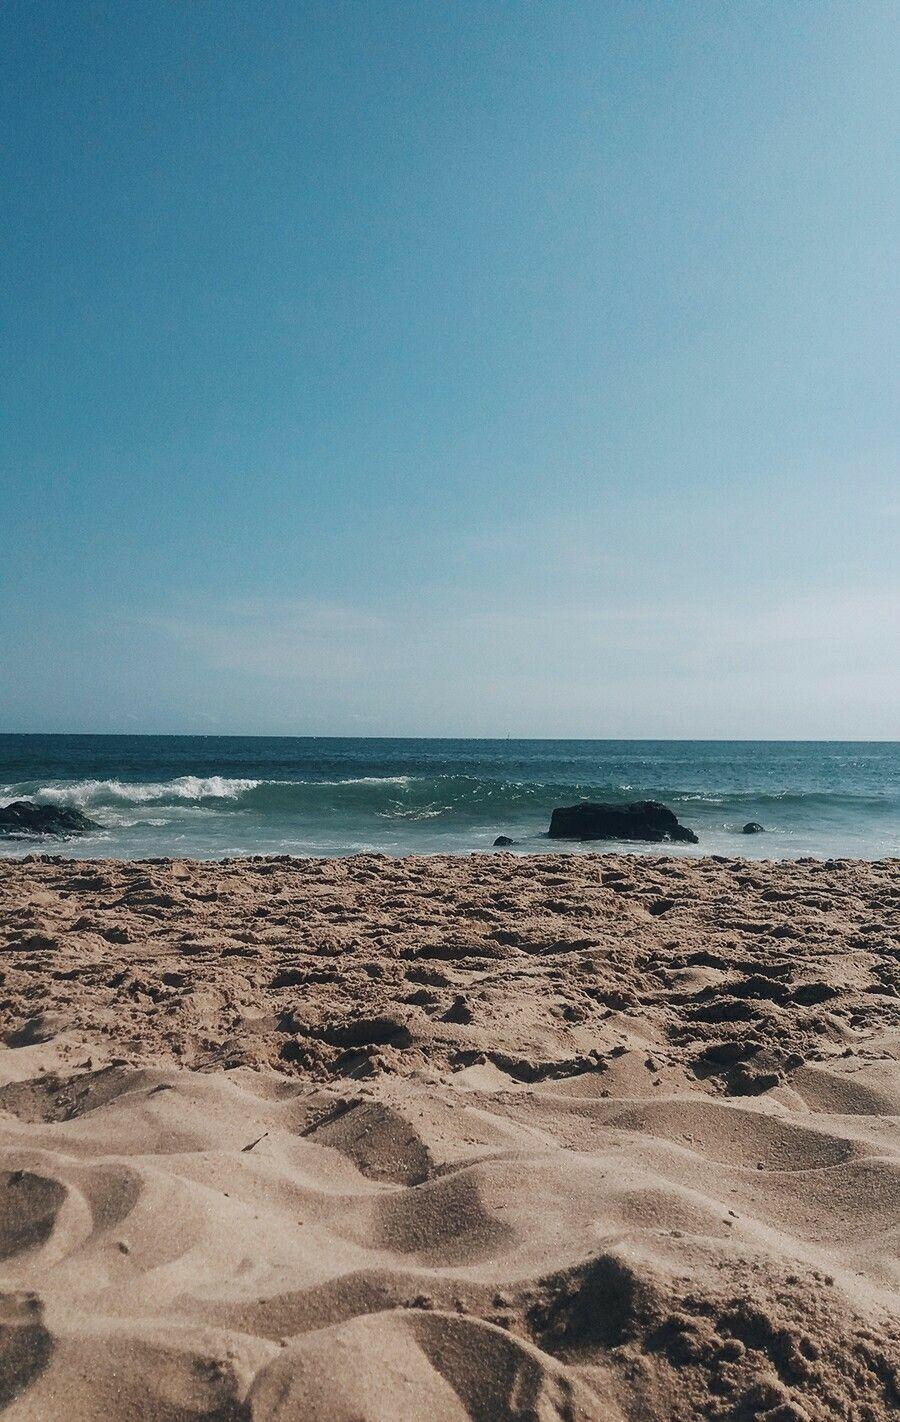 Pin by Hatem Elhabashy on Mediterranean Sea | Beach ...